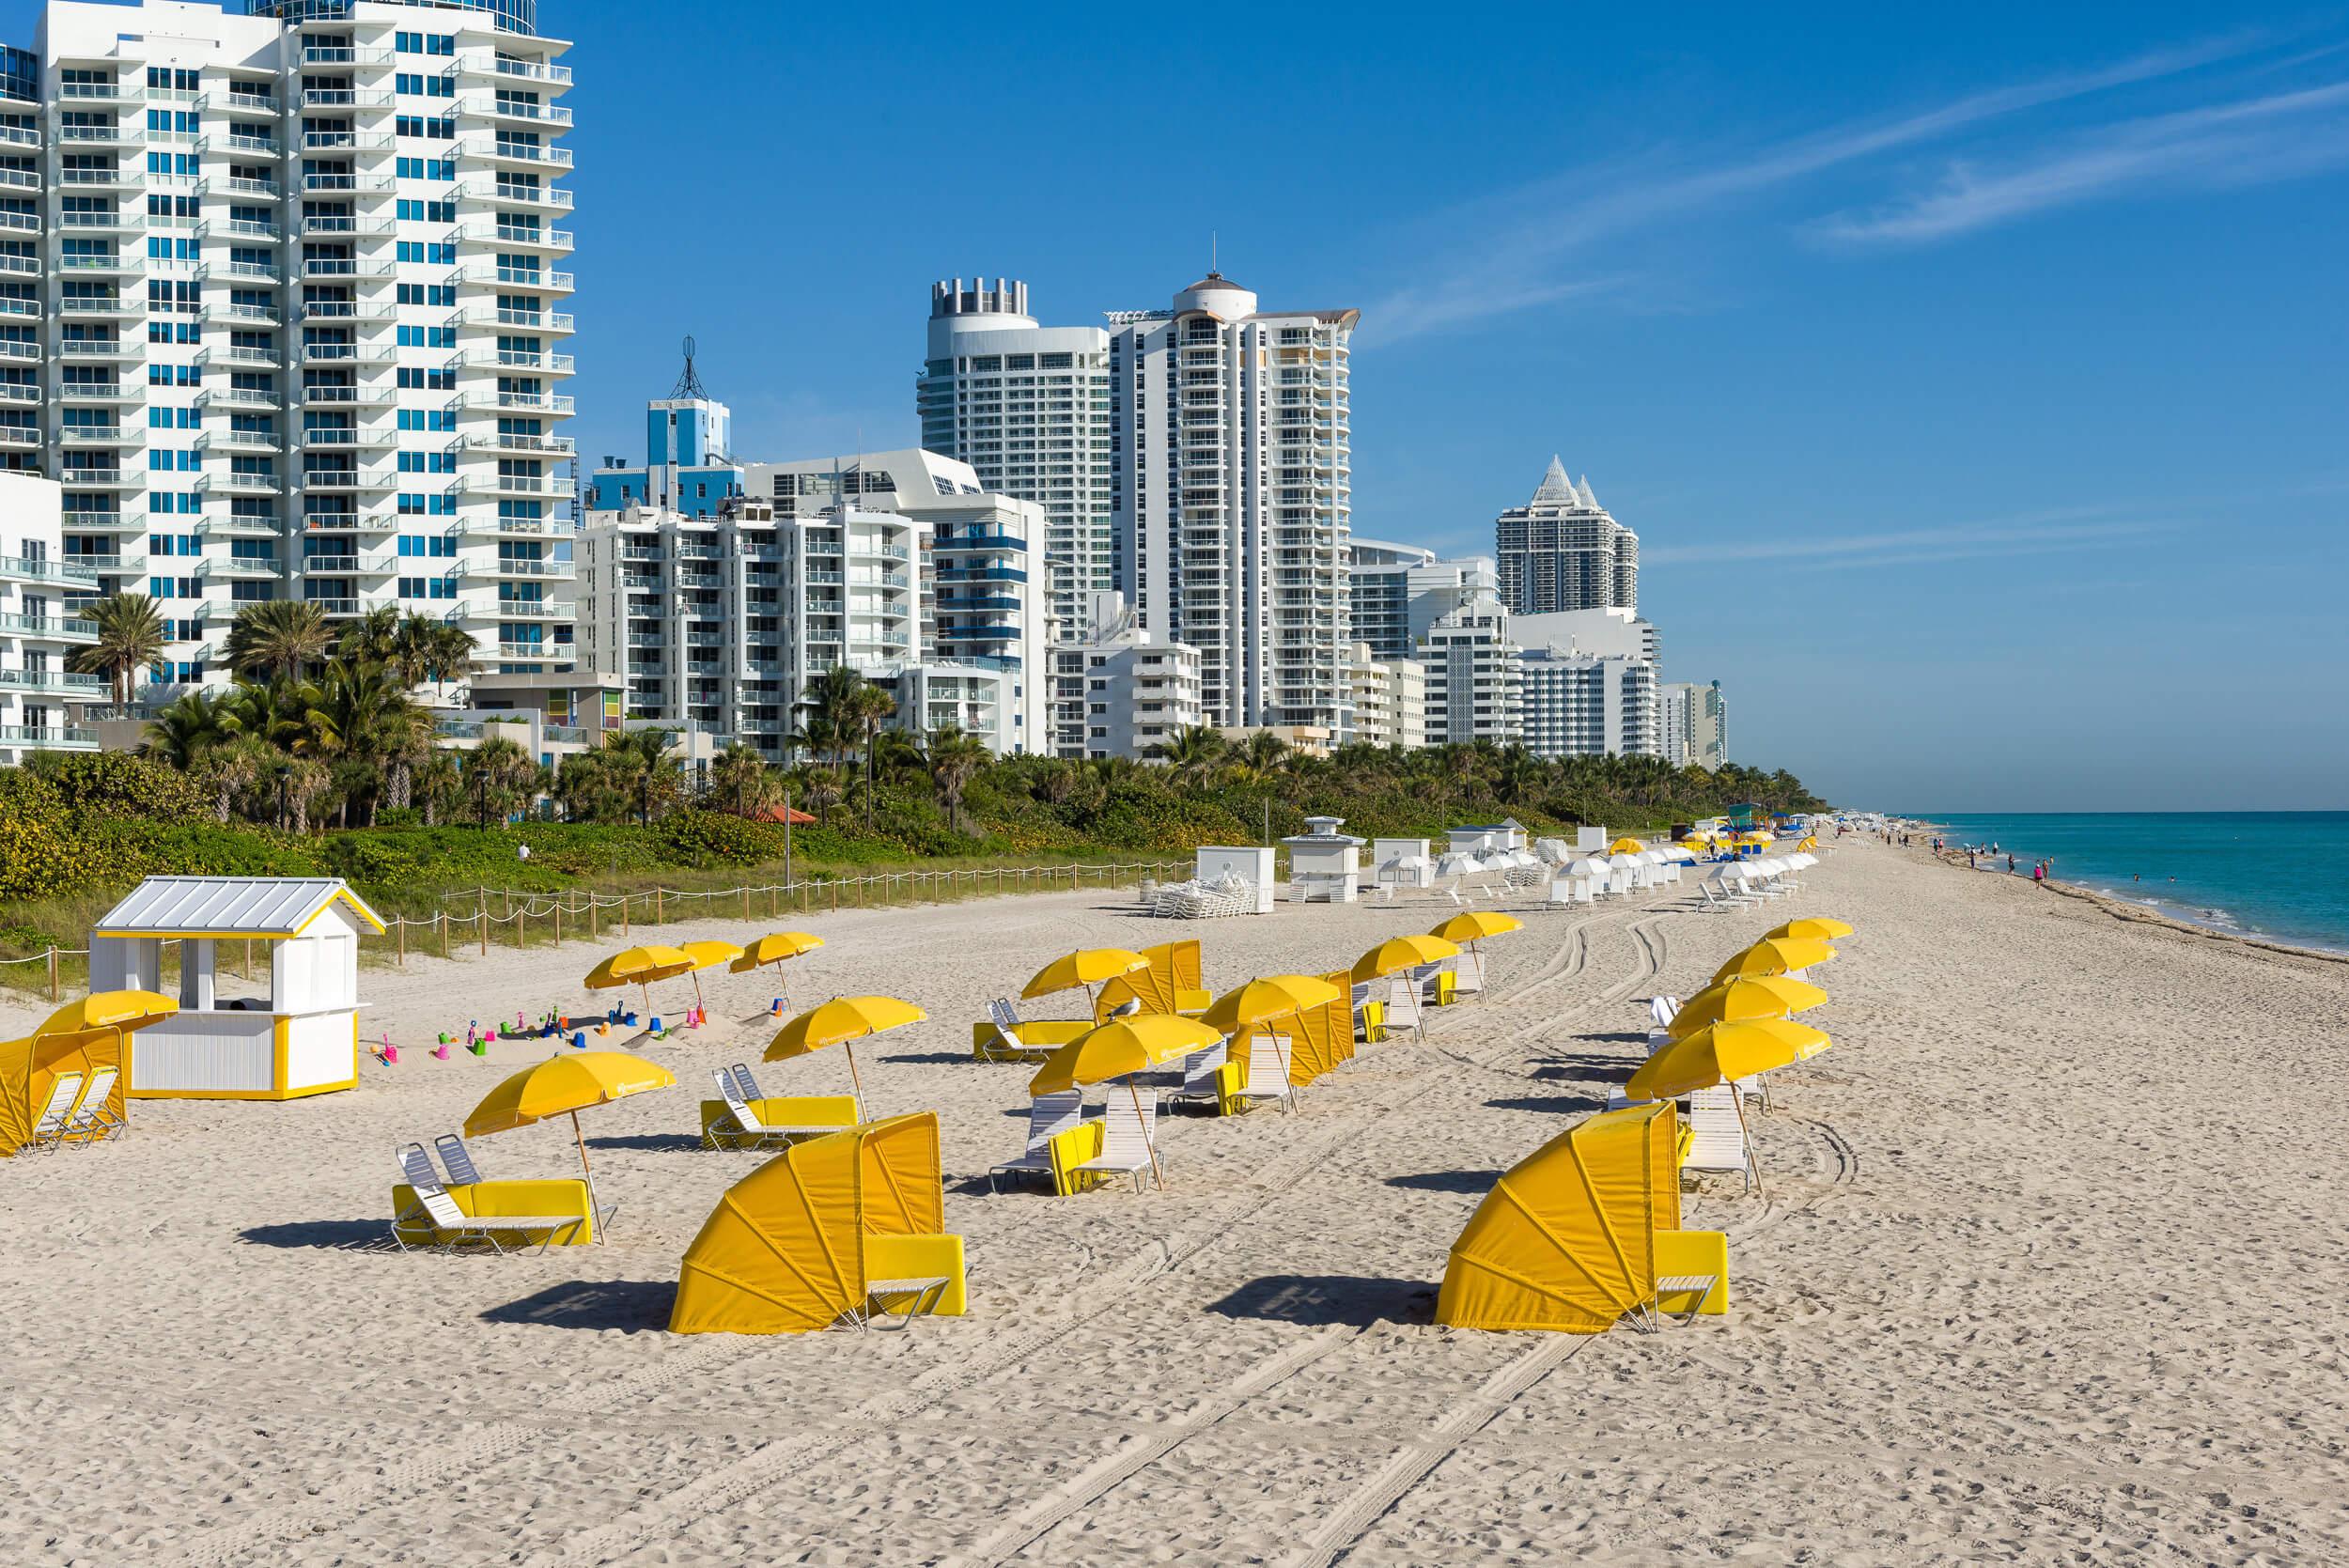 Westgate South Beach C Sands Image